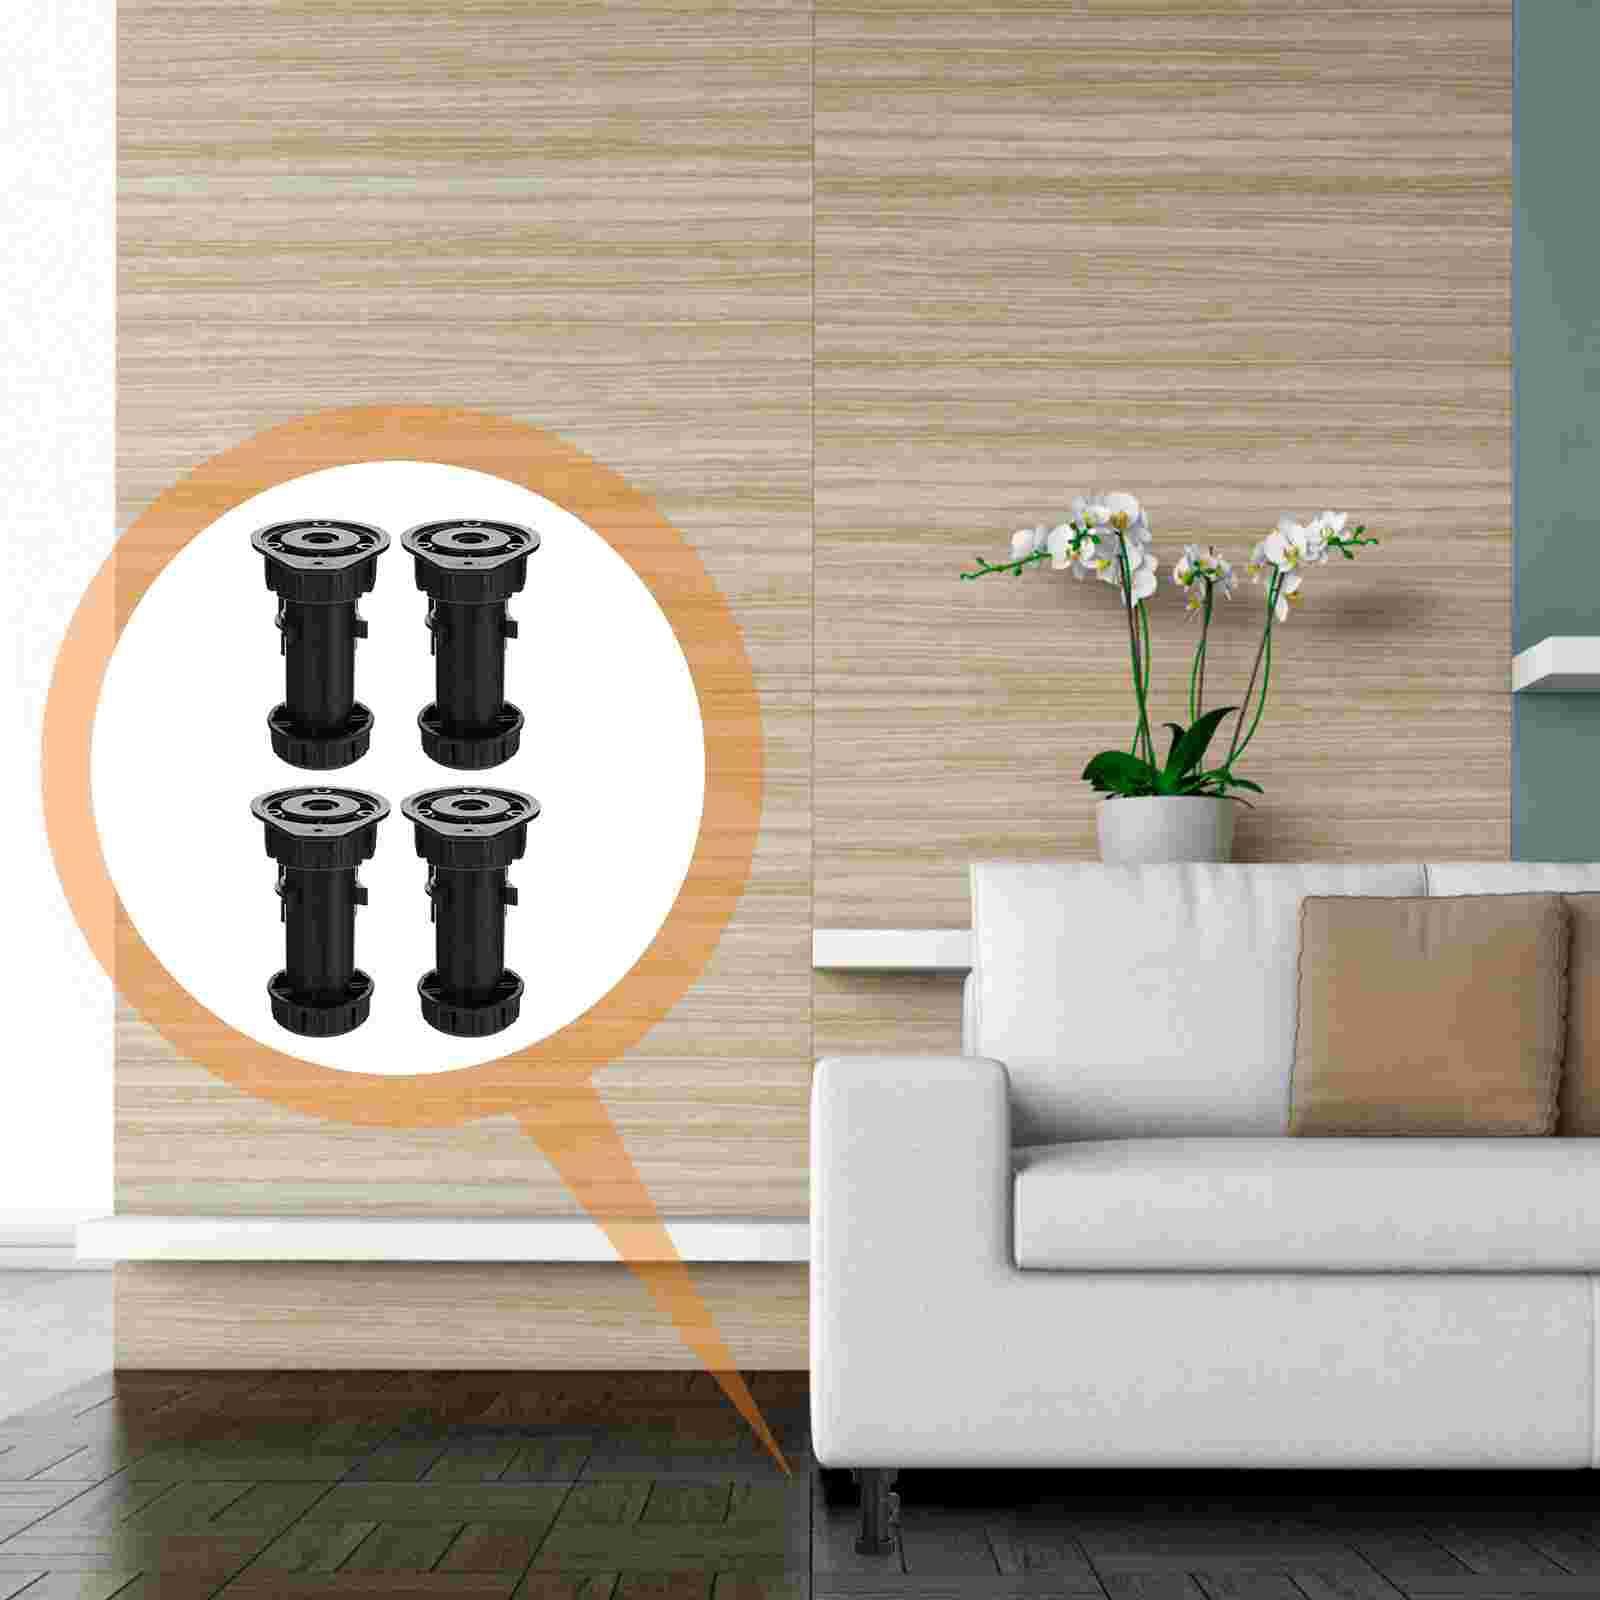 10pcs Multi-purpose Furniture Heightening Feet Pads Table Legs Anti-slip Mat